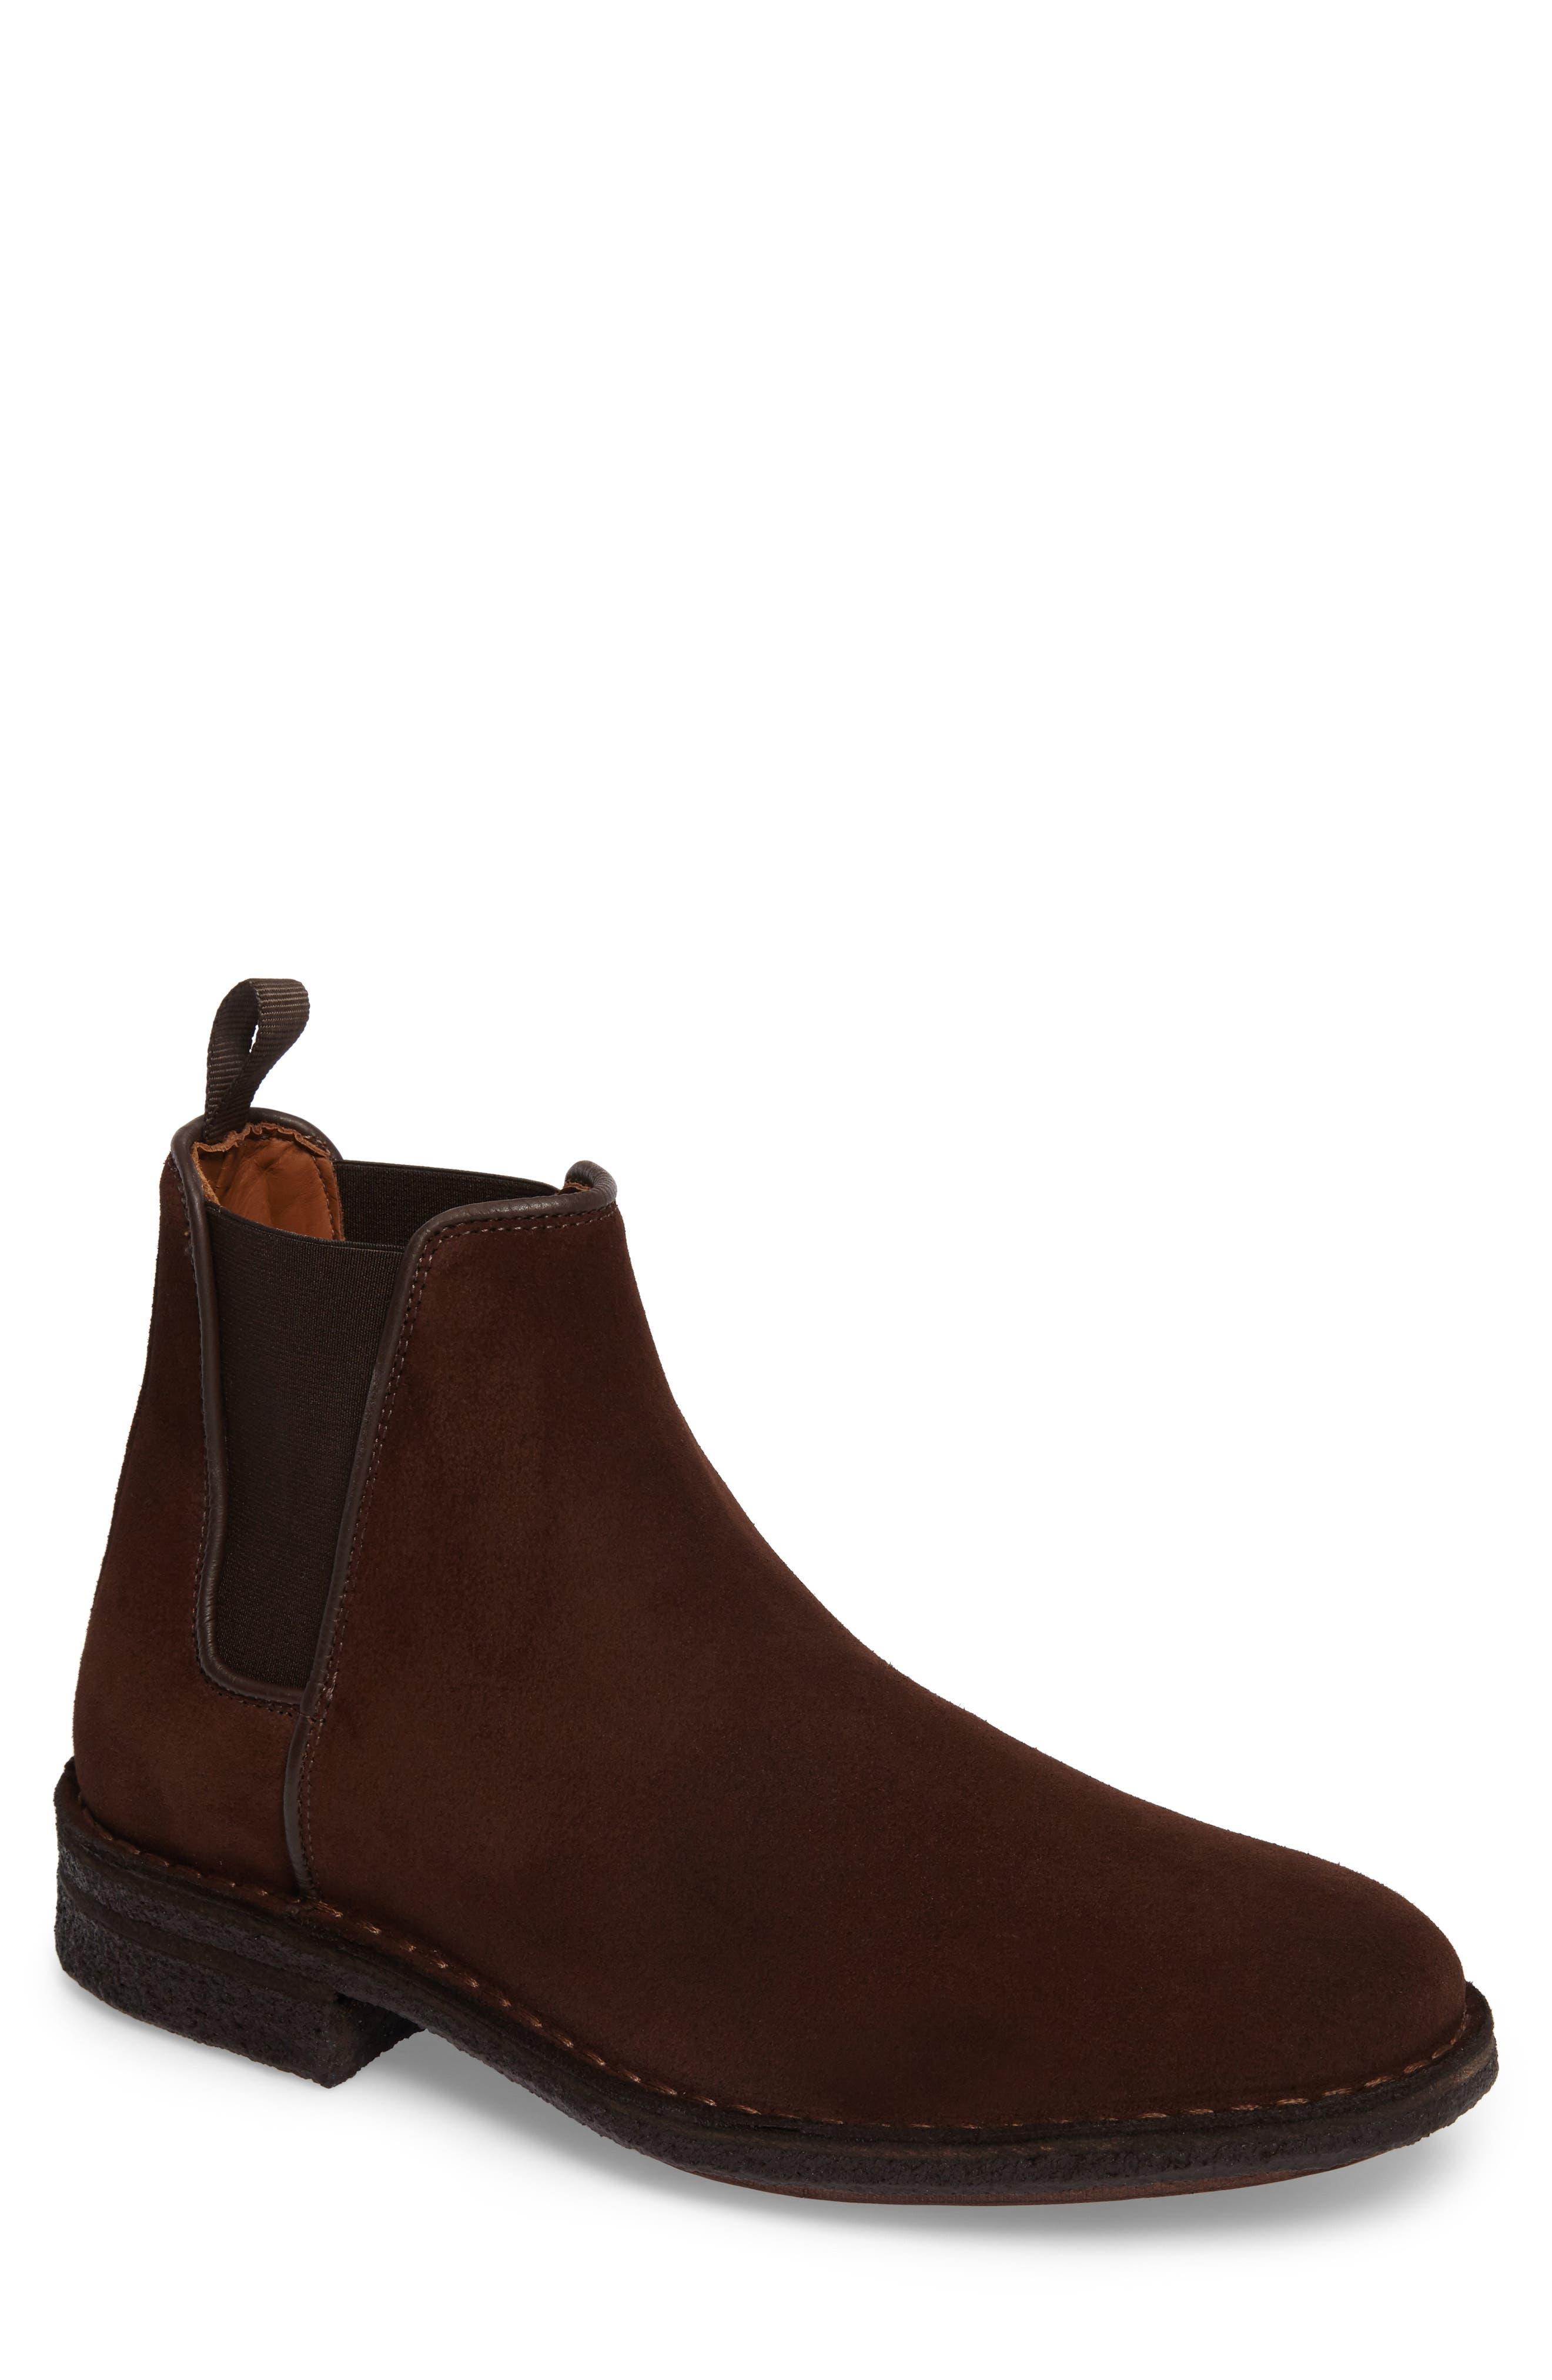 Main Image - Aquatalia Oscar Chelsea Boot (Men)